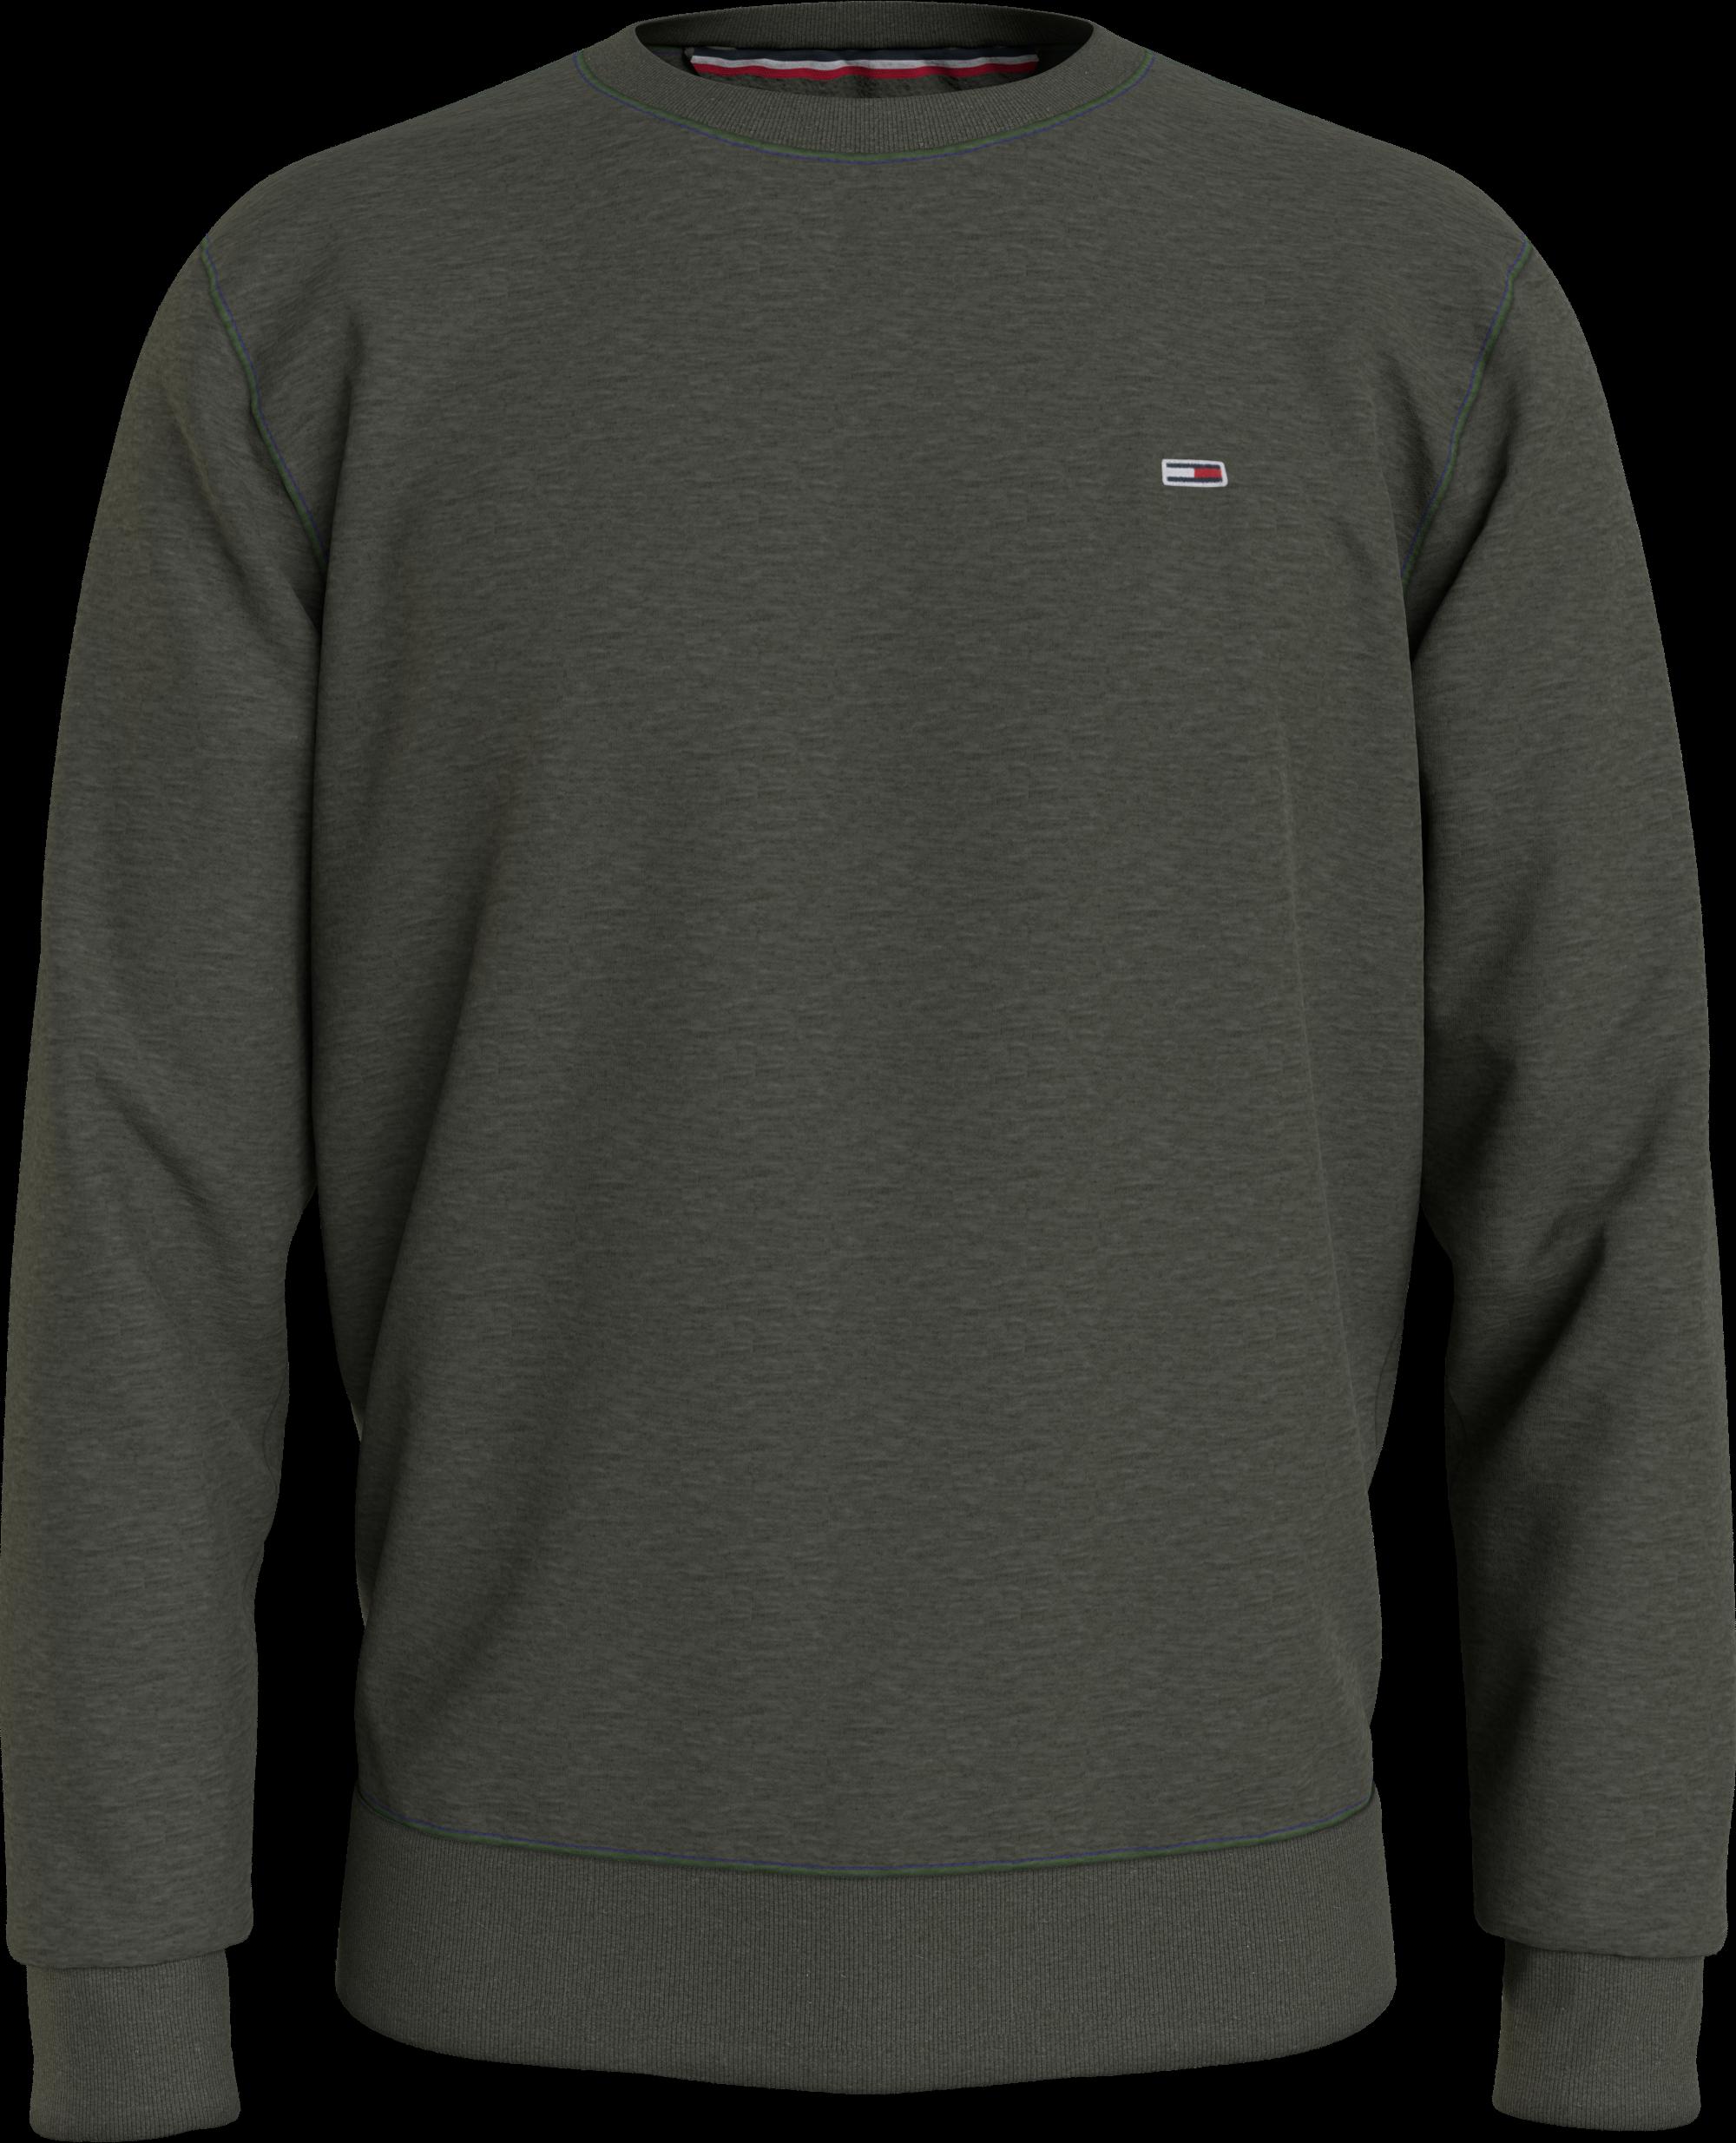 Hilfiger Denim Flag Patch Fleece Sweatshirt